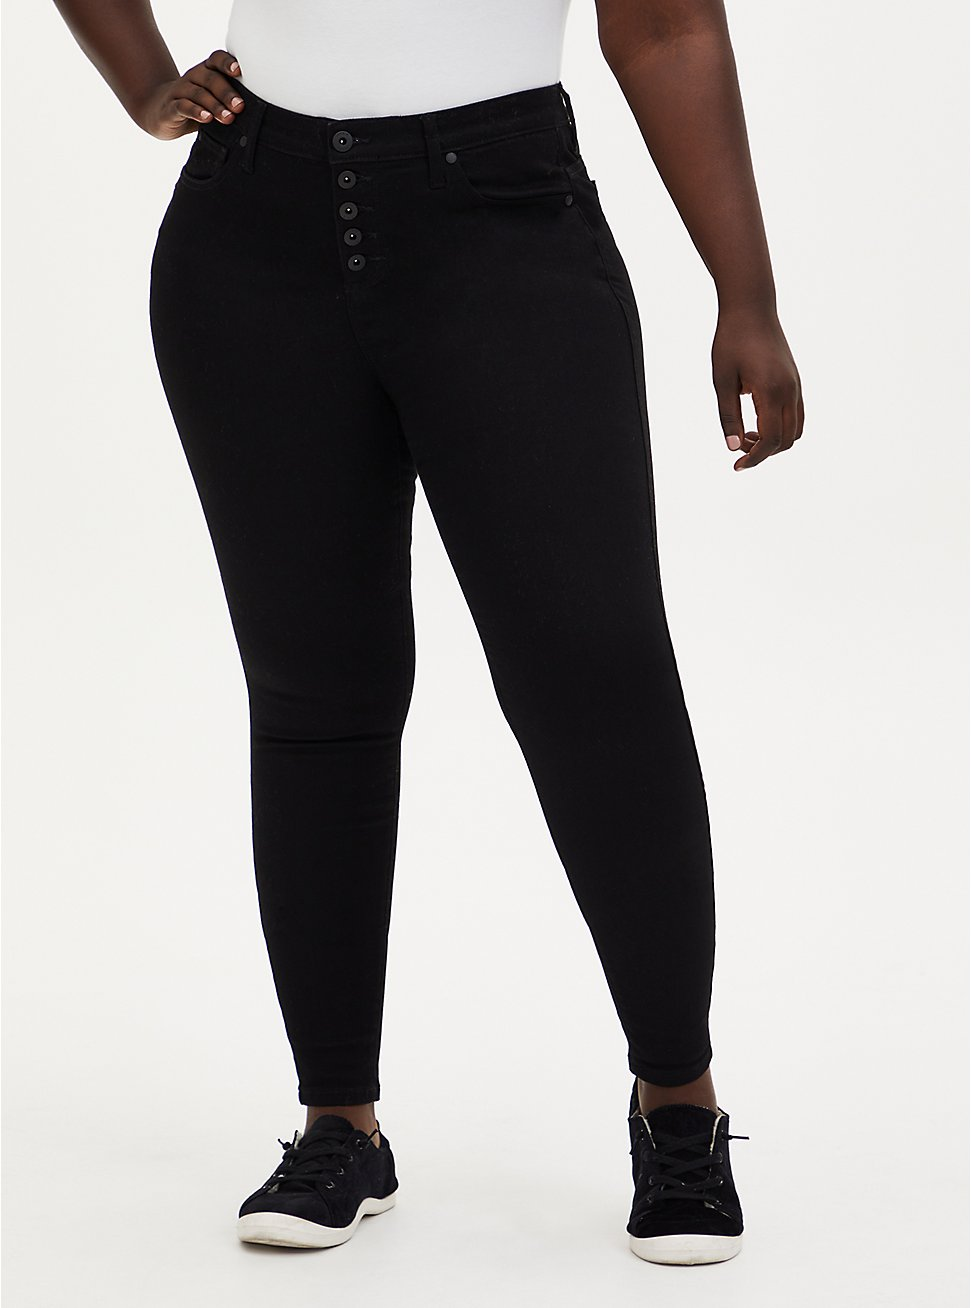 Bombshell Skinny Jean - Super Soft Black, , fitModel1-hires